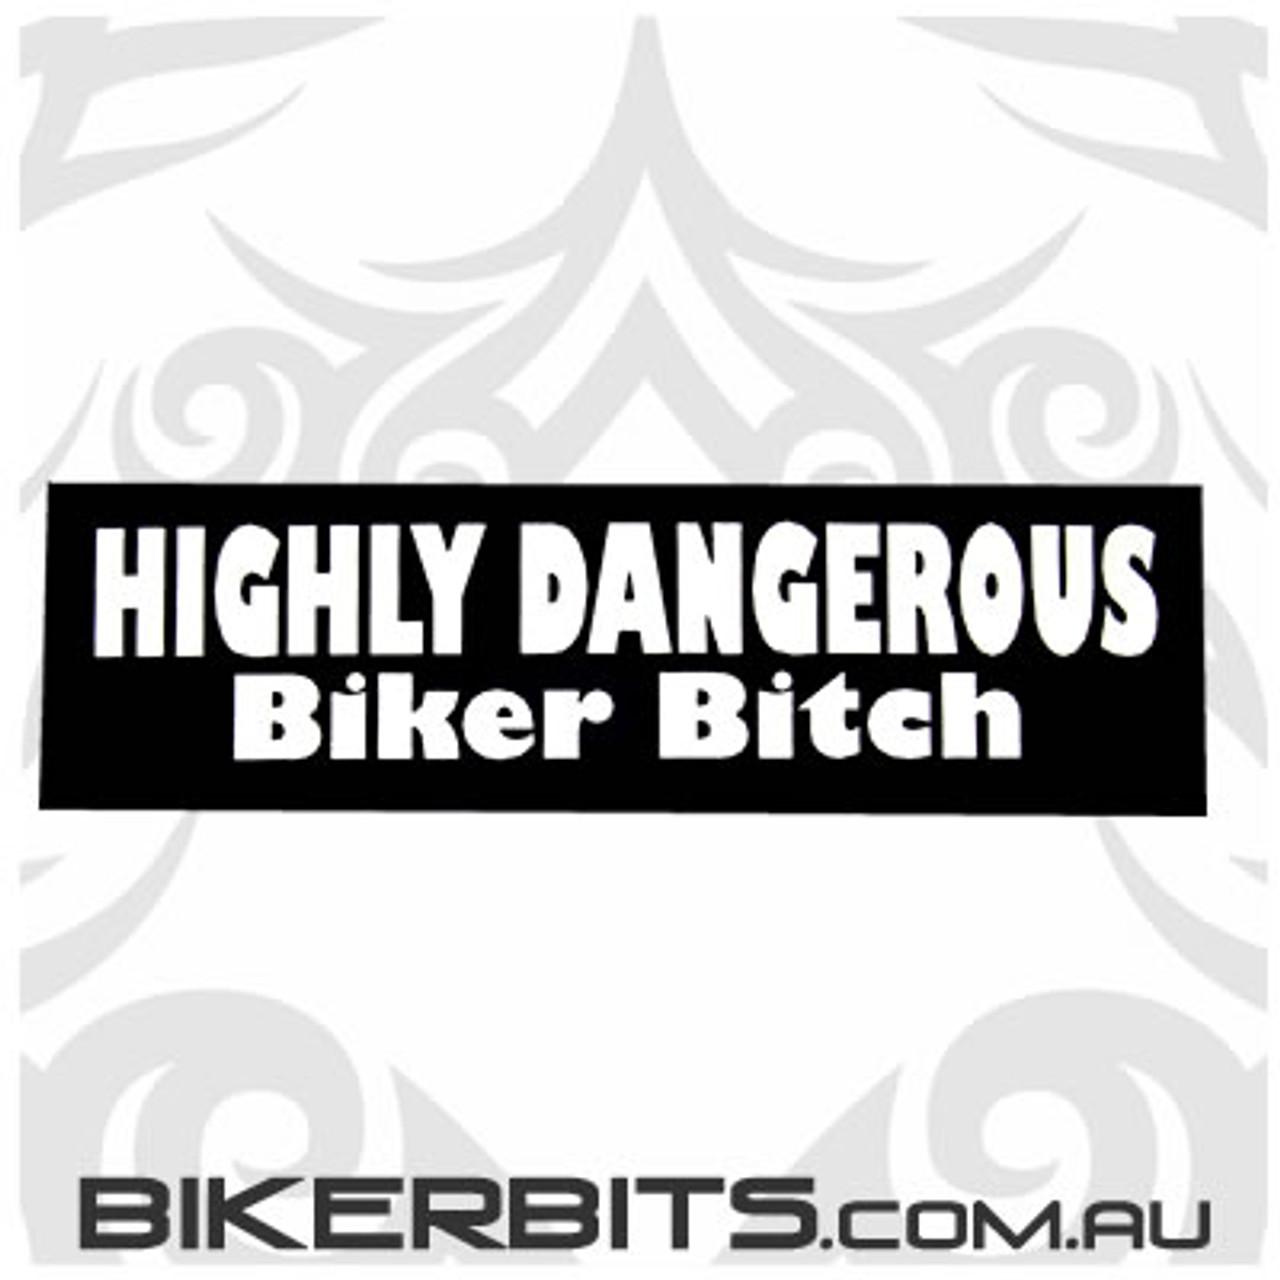 Helmet Sticker - Highly Dangerous Biker Bitch